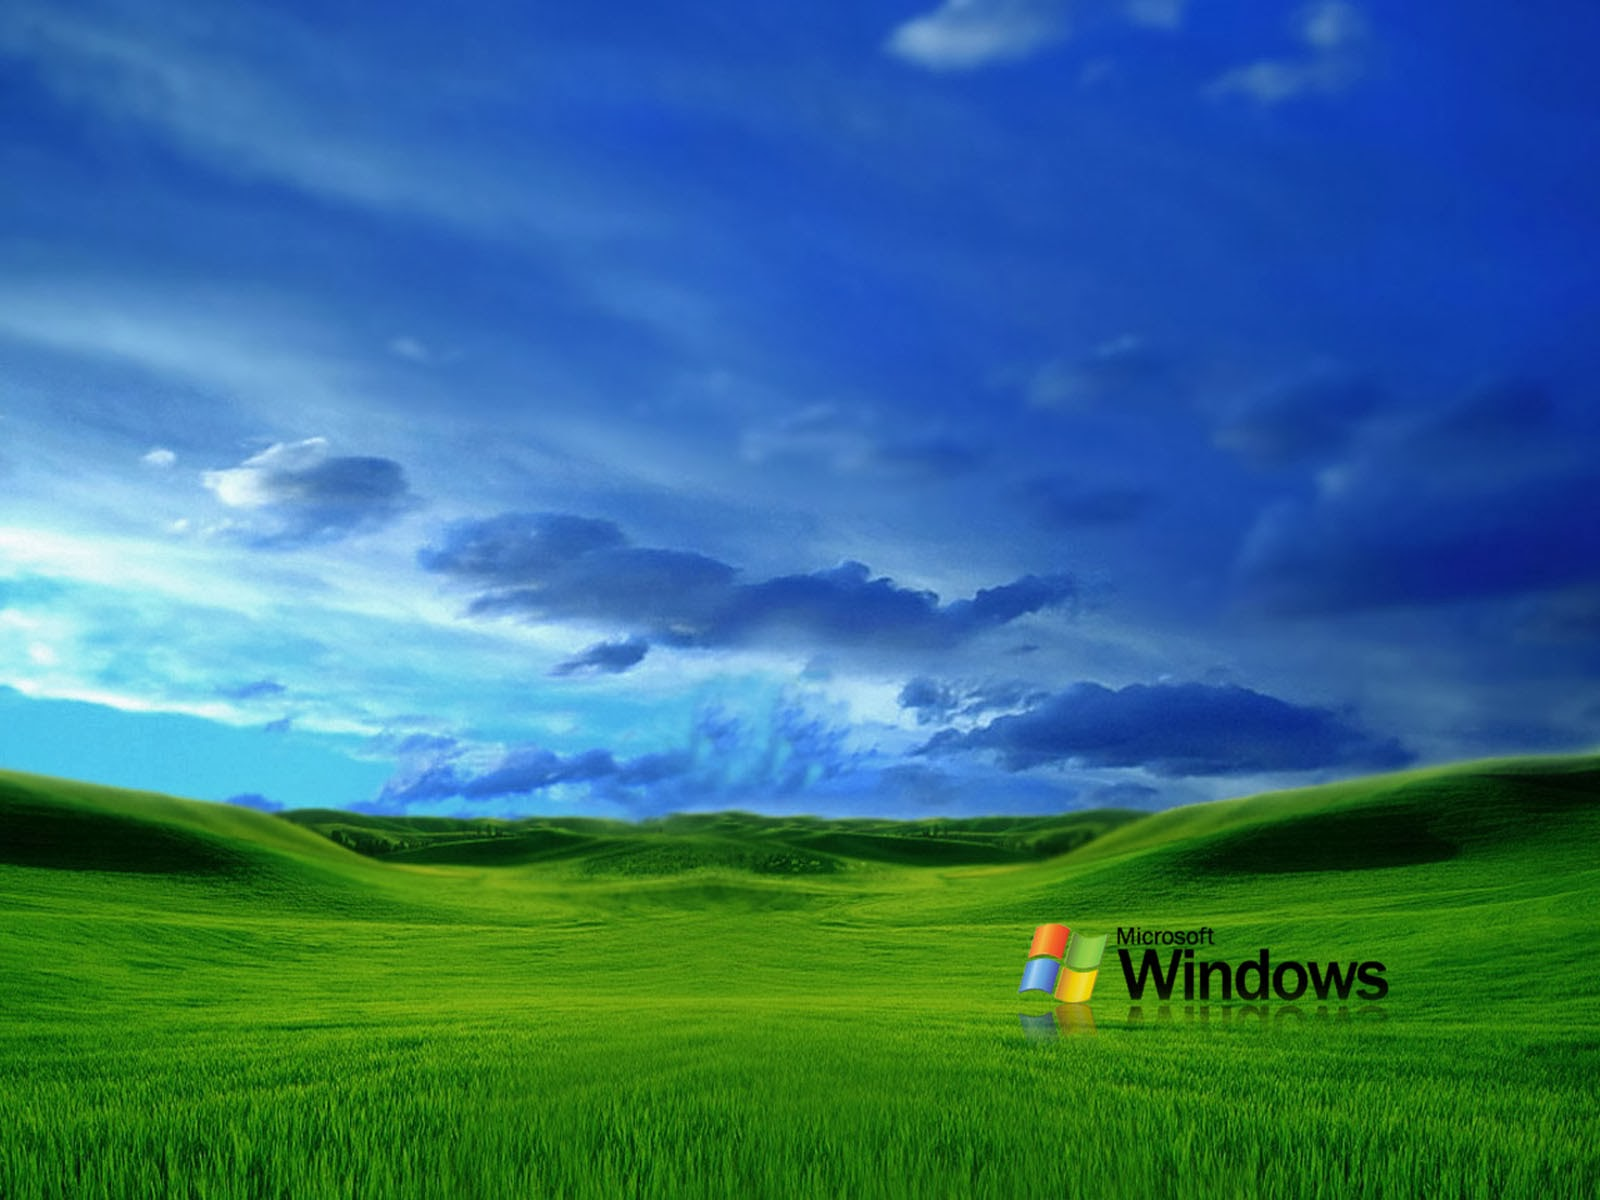 Wallpapers Grass Windows XP Wallpapers